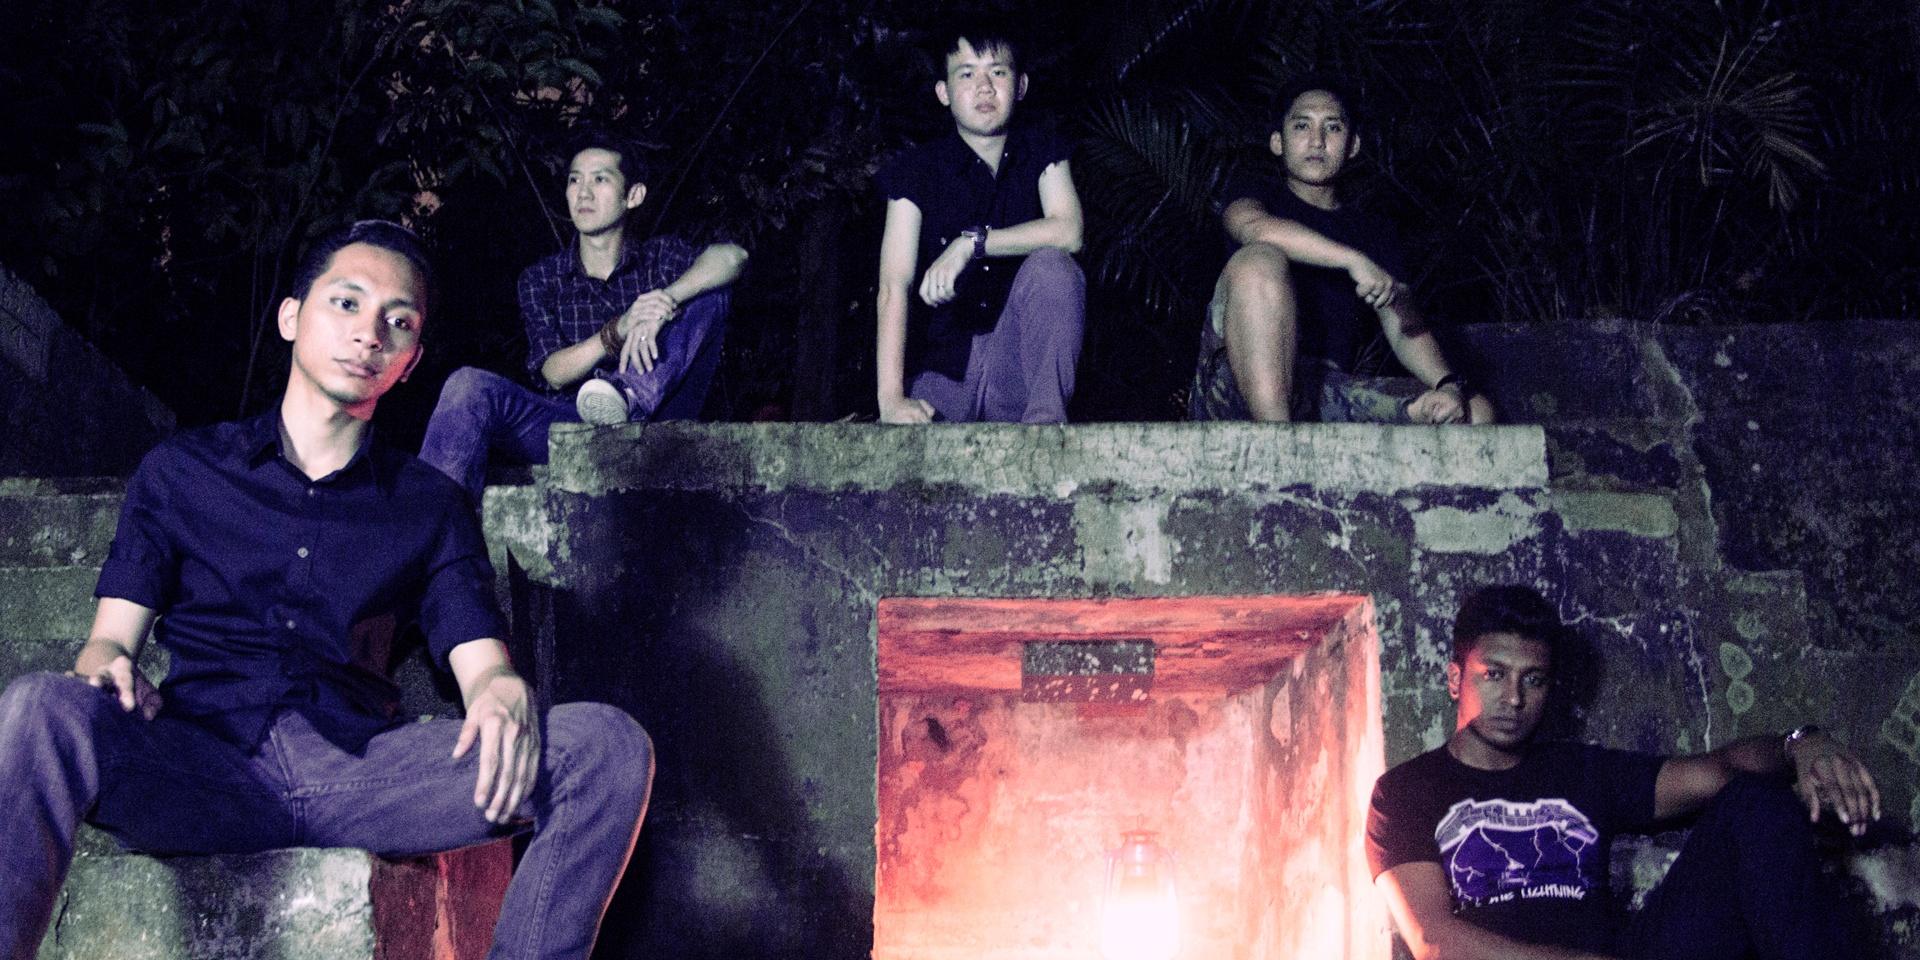 LISTEN: Singaporean death metal band Assault tease their searing, extreme upcoming album